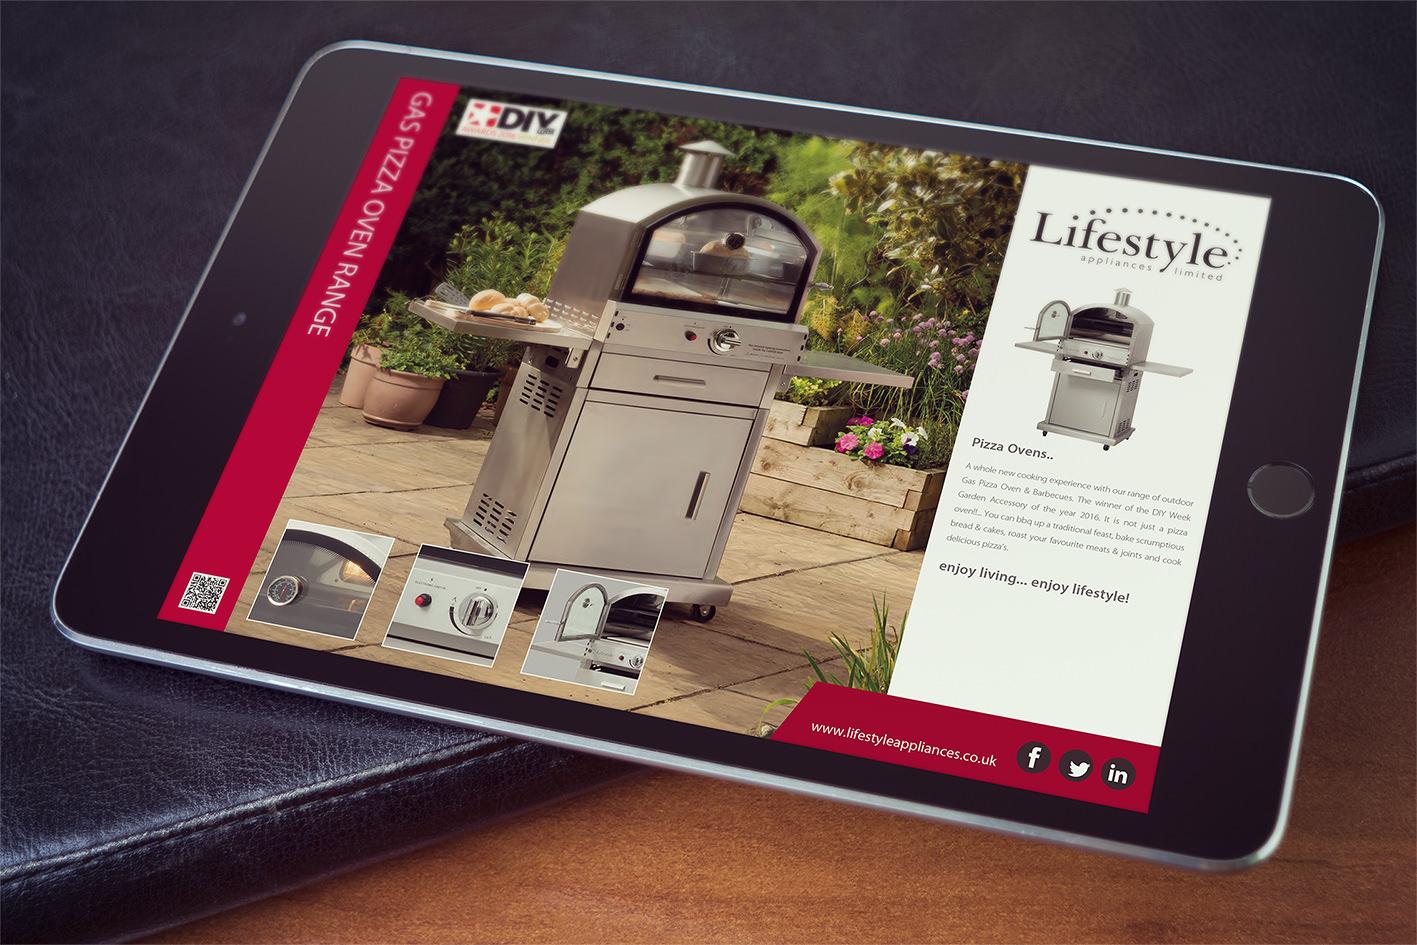 DATASHEETS & ONLINE BROCHURE & CATALOGUES Zest! Graphics Ltd - Graphic Design and Print Redditch Wor